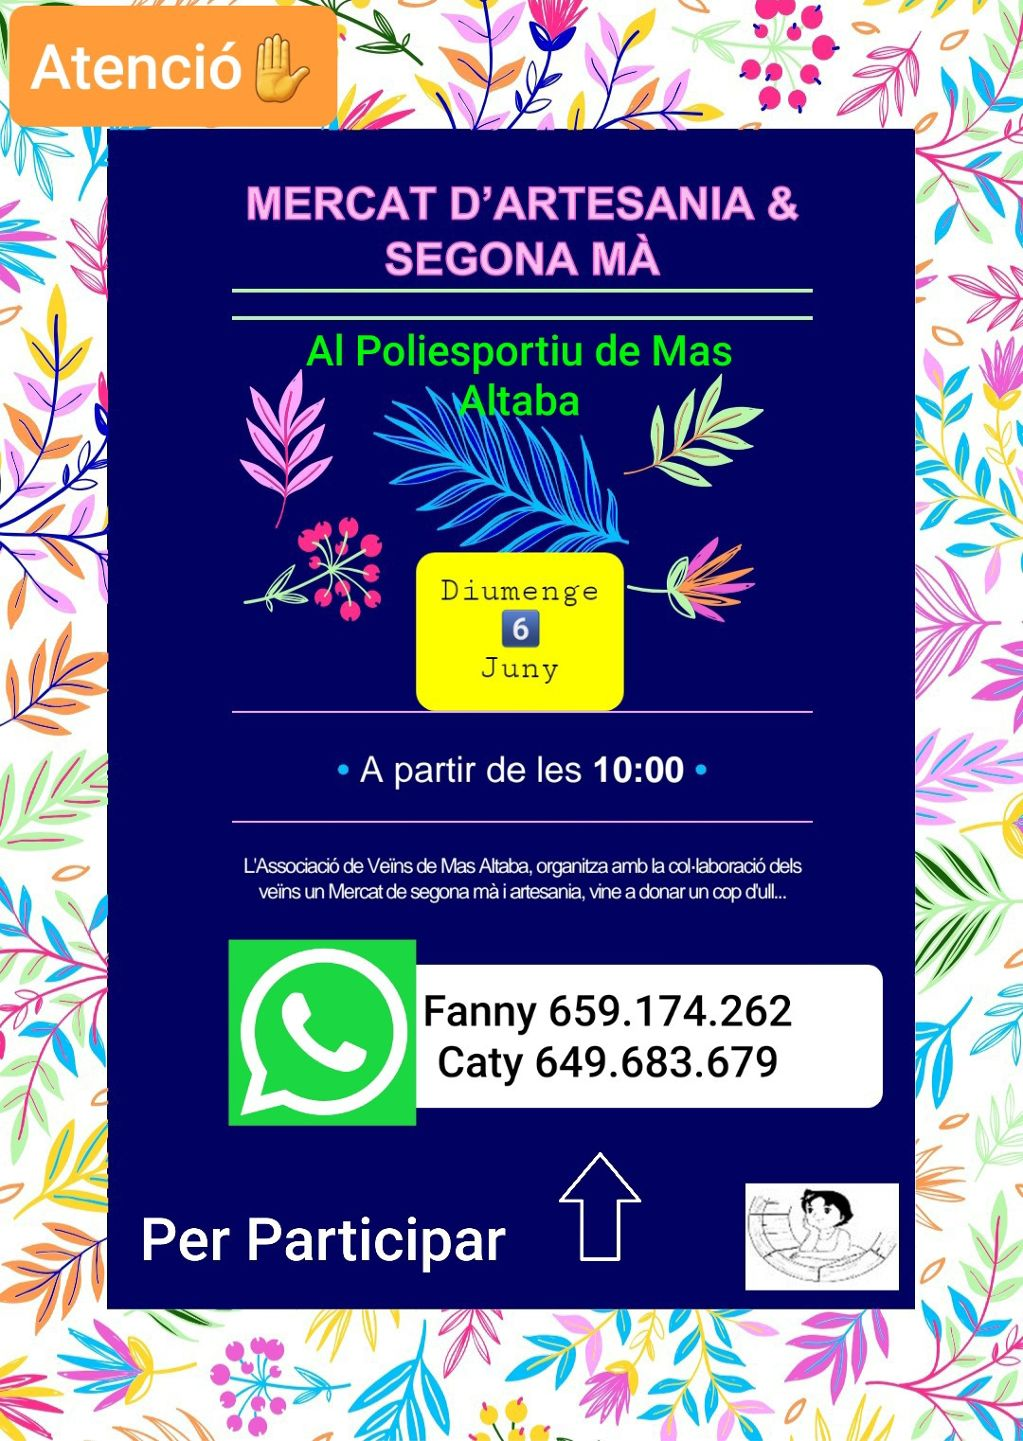 Mercat del Trasto a Mas Altaba - cbc67-WhatsApp-Image-2021-05-24-at-15.43.22.jpeg